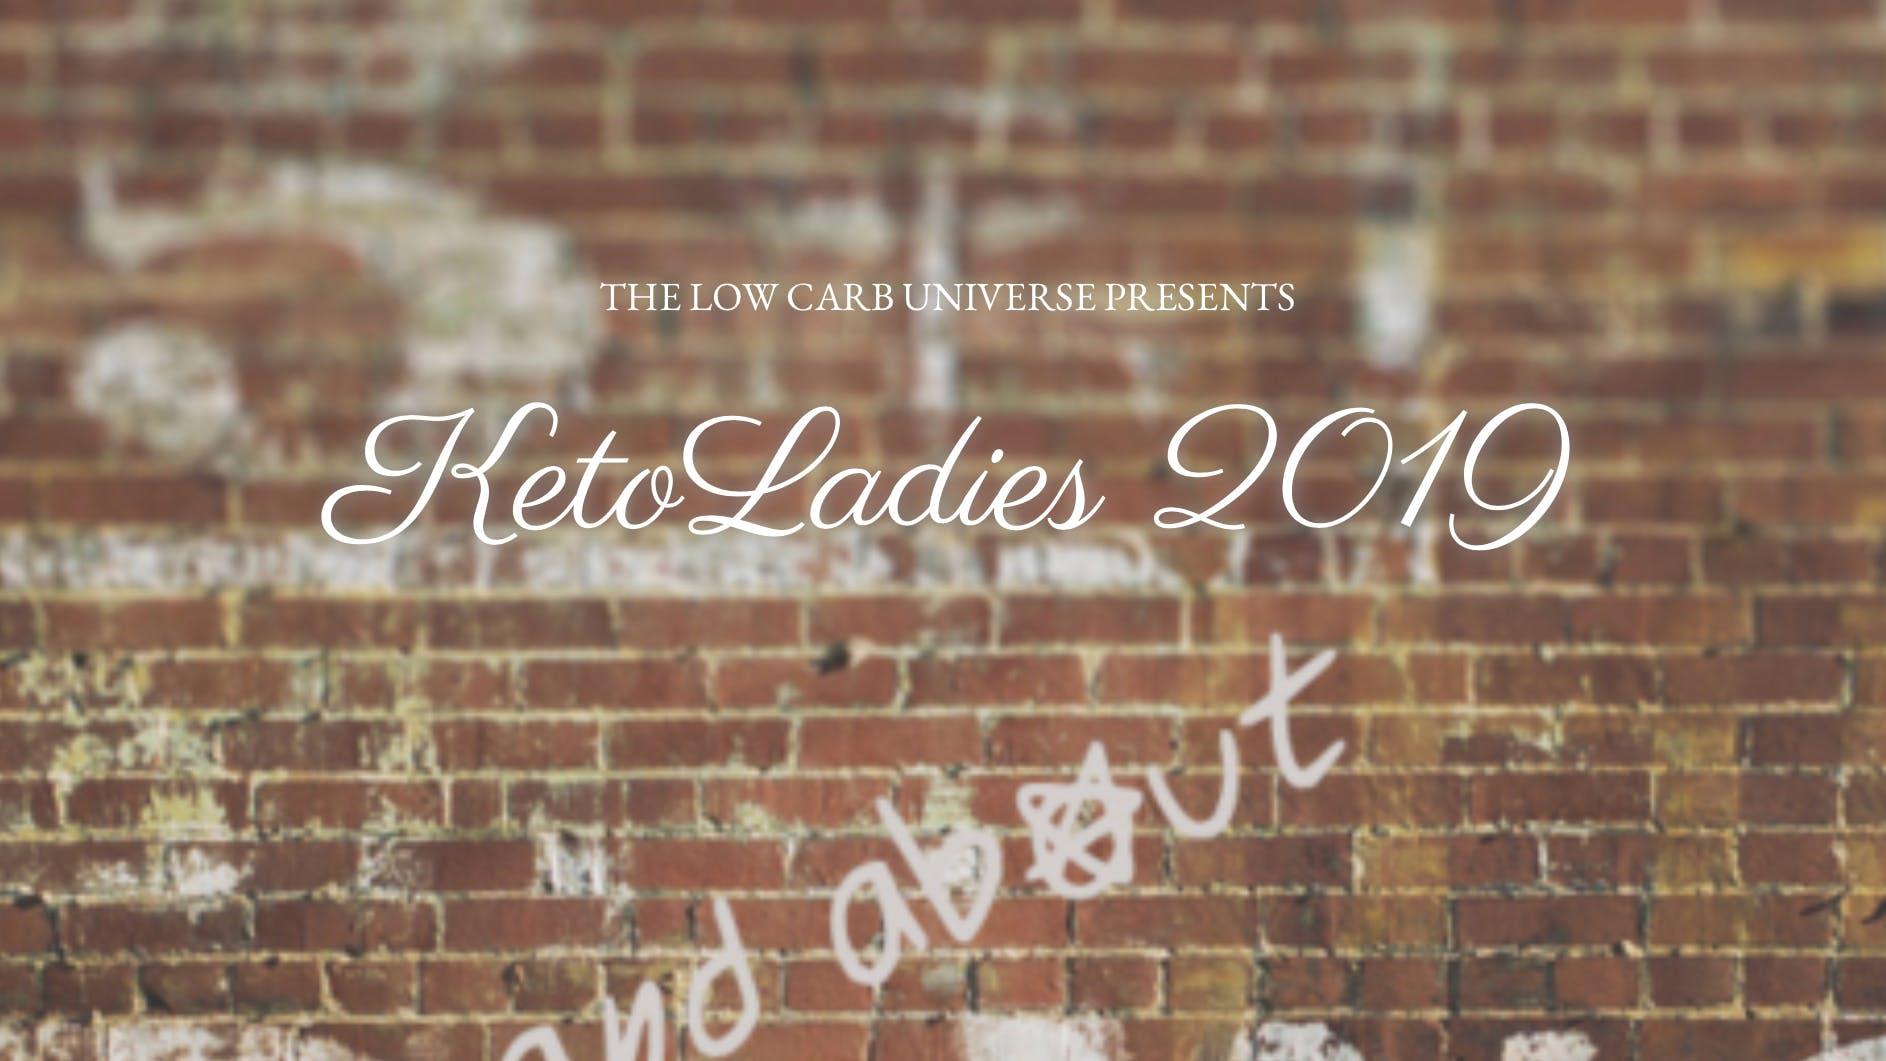 Keto ladies 2019